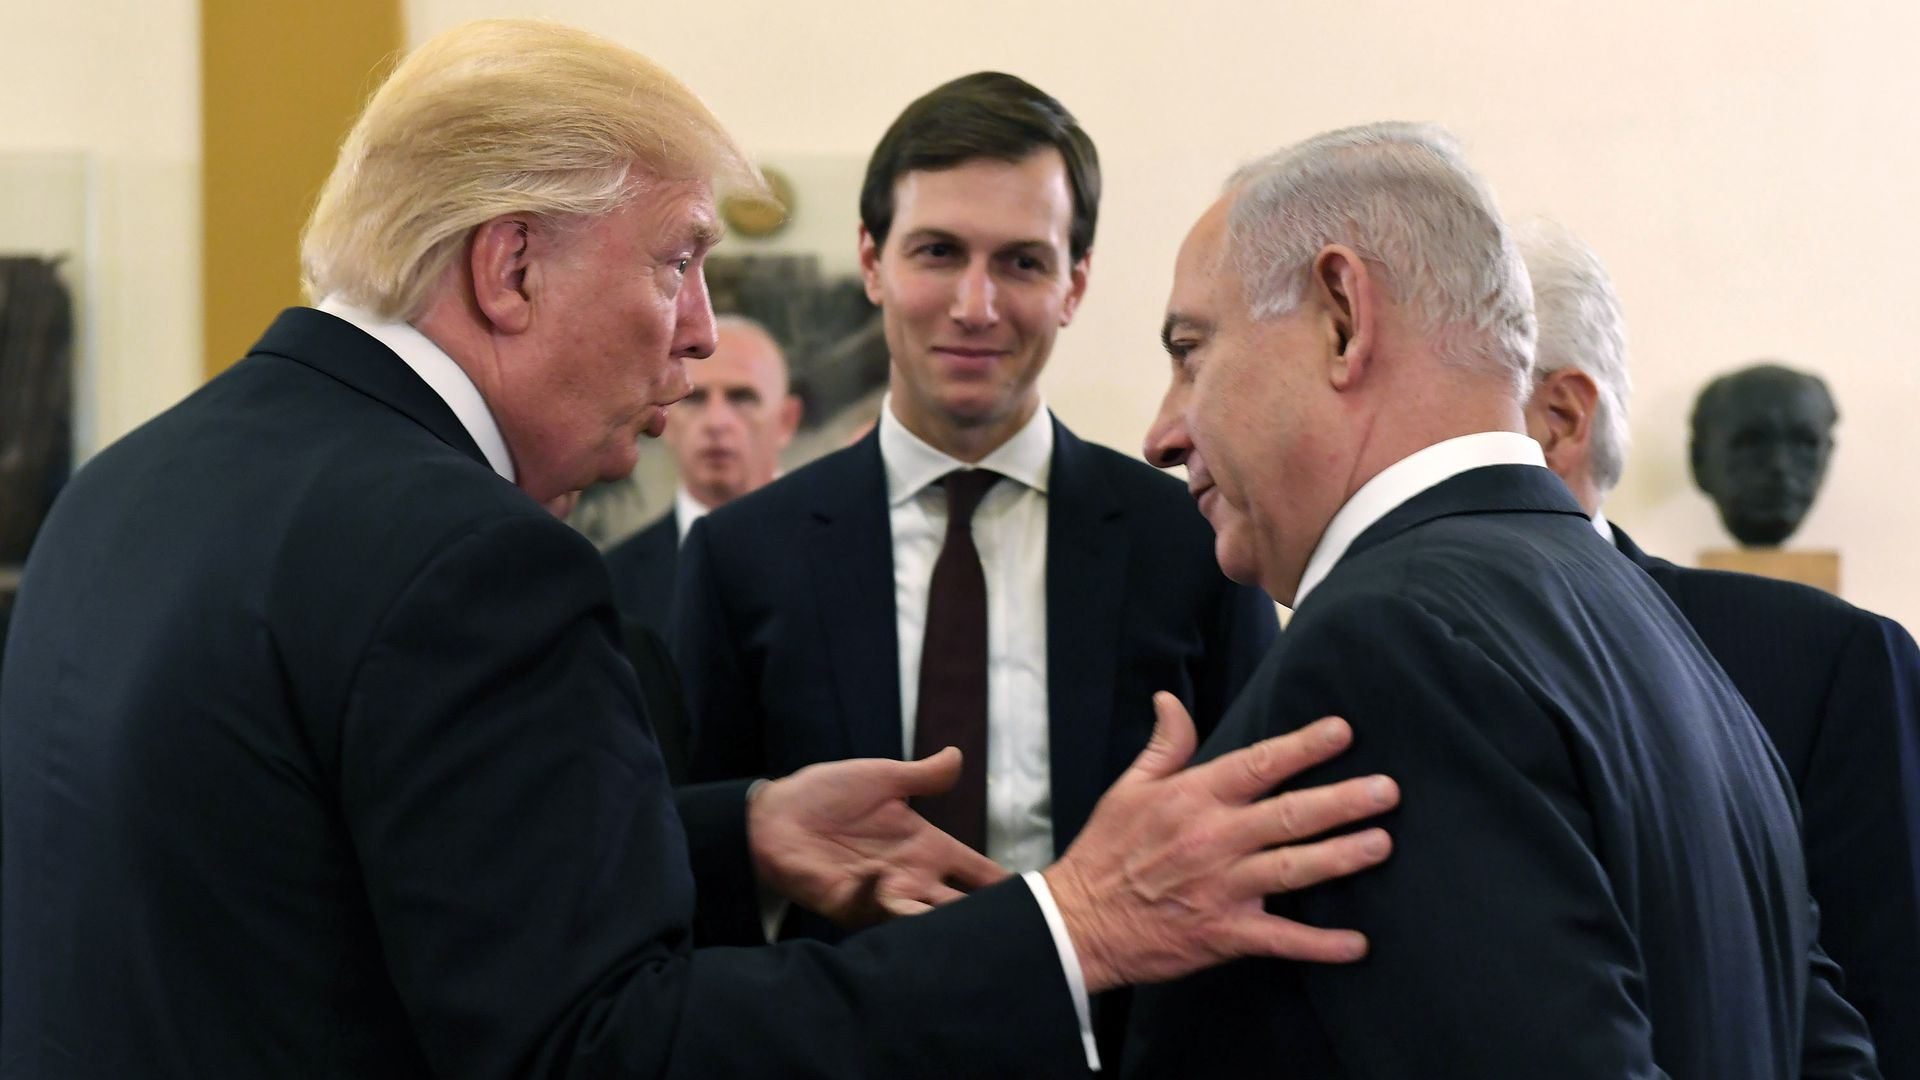 Image result for picture of trump, pompeo, bolton, kushner, netanyahu